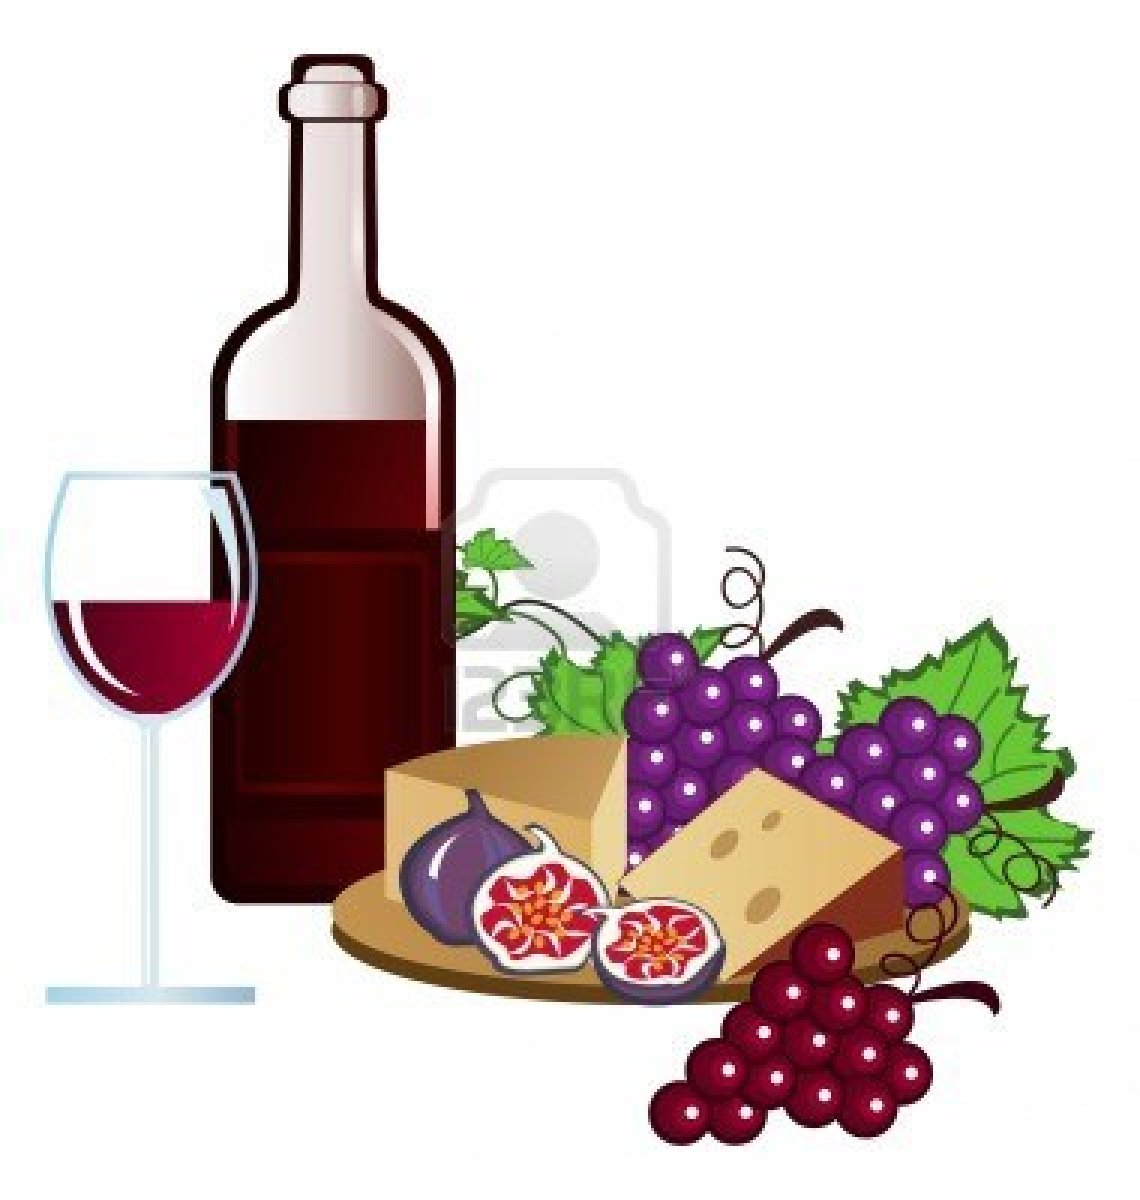 Wine Tasting Clipart.